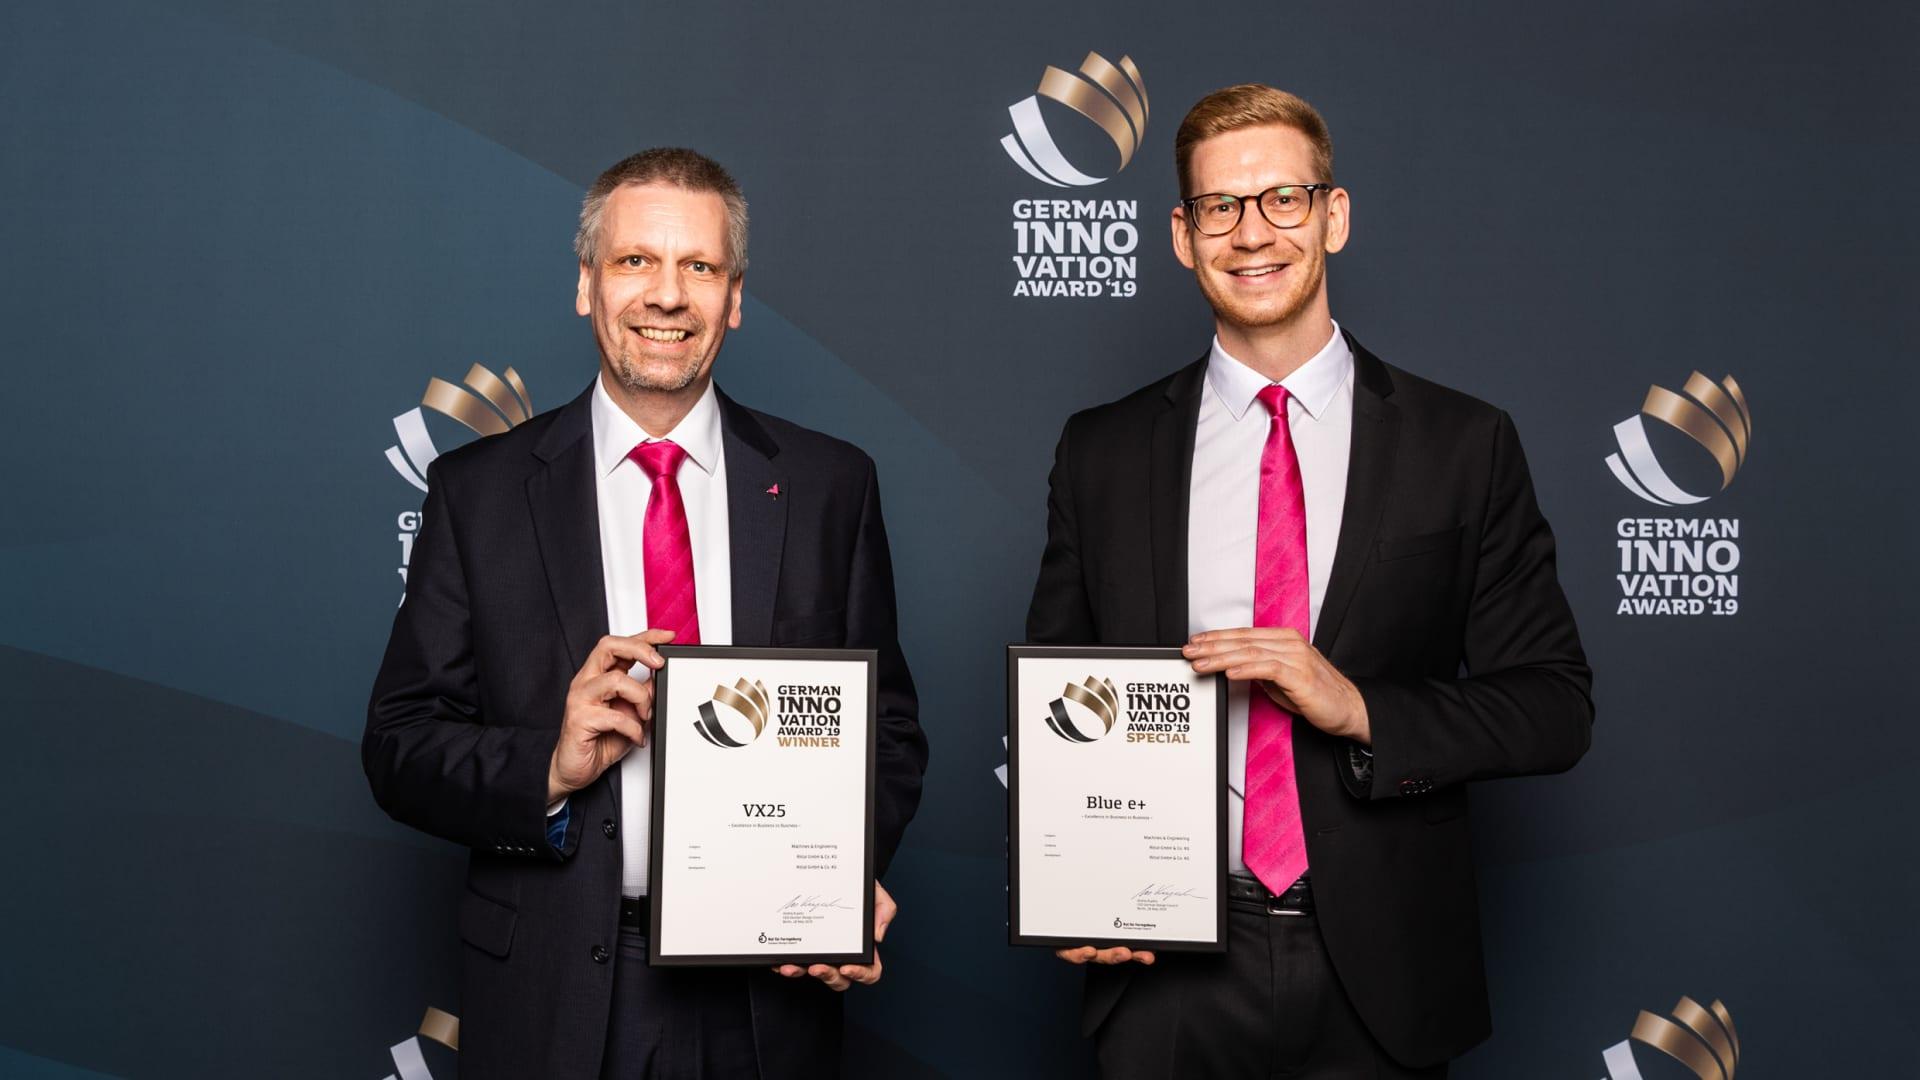 Rittal erhält German Innovation Award 2019